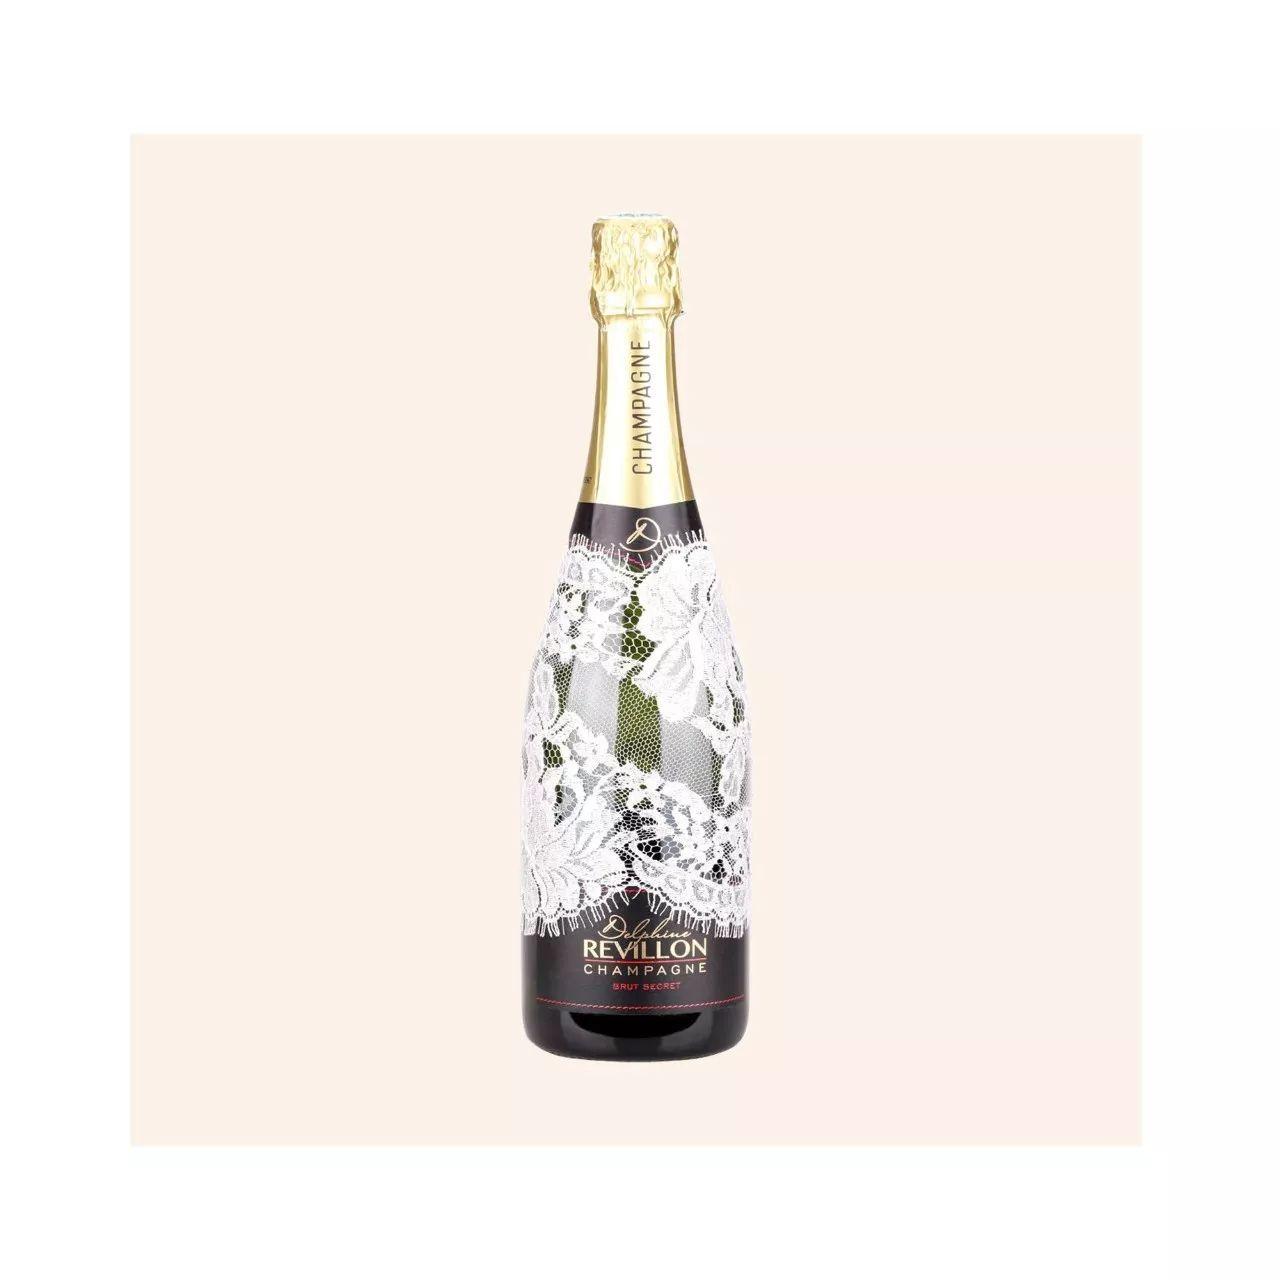 Figaro味道 | 假日中的甘醇的美酒,为你开启欢乐新一年